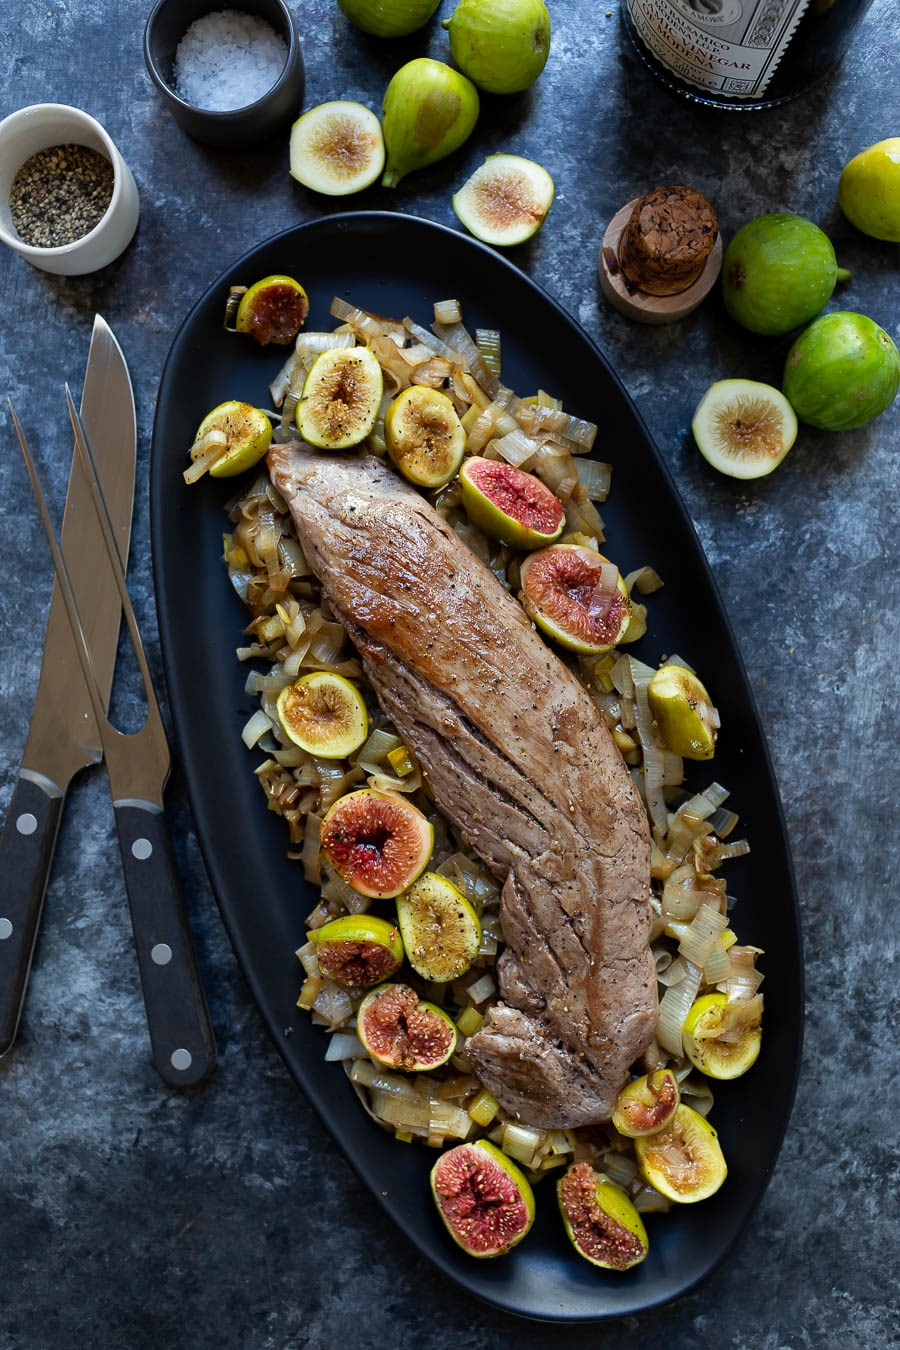 Roasted Pork Tenderloin with Figs